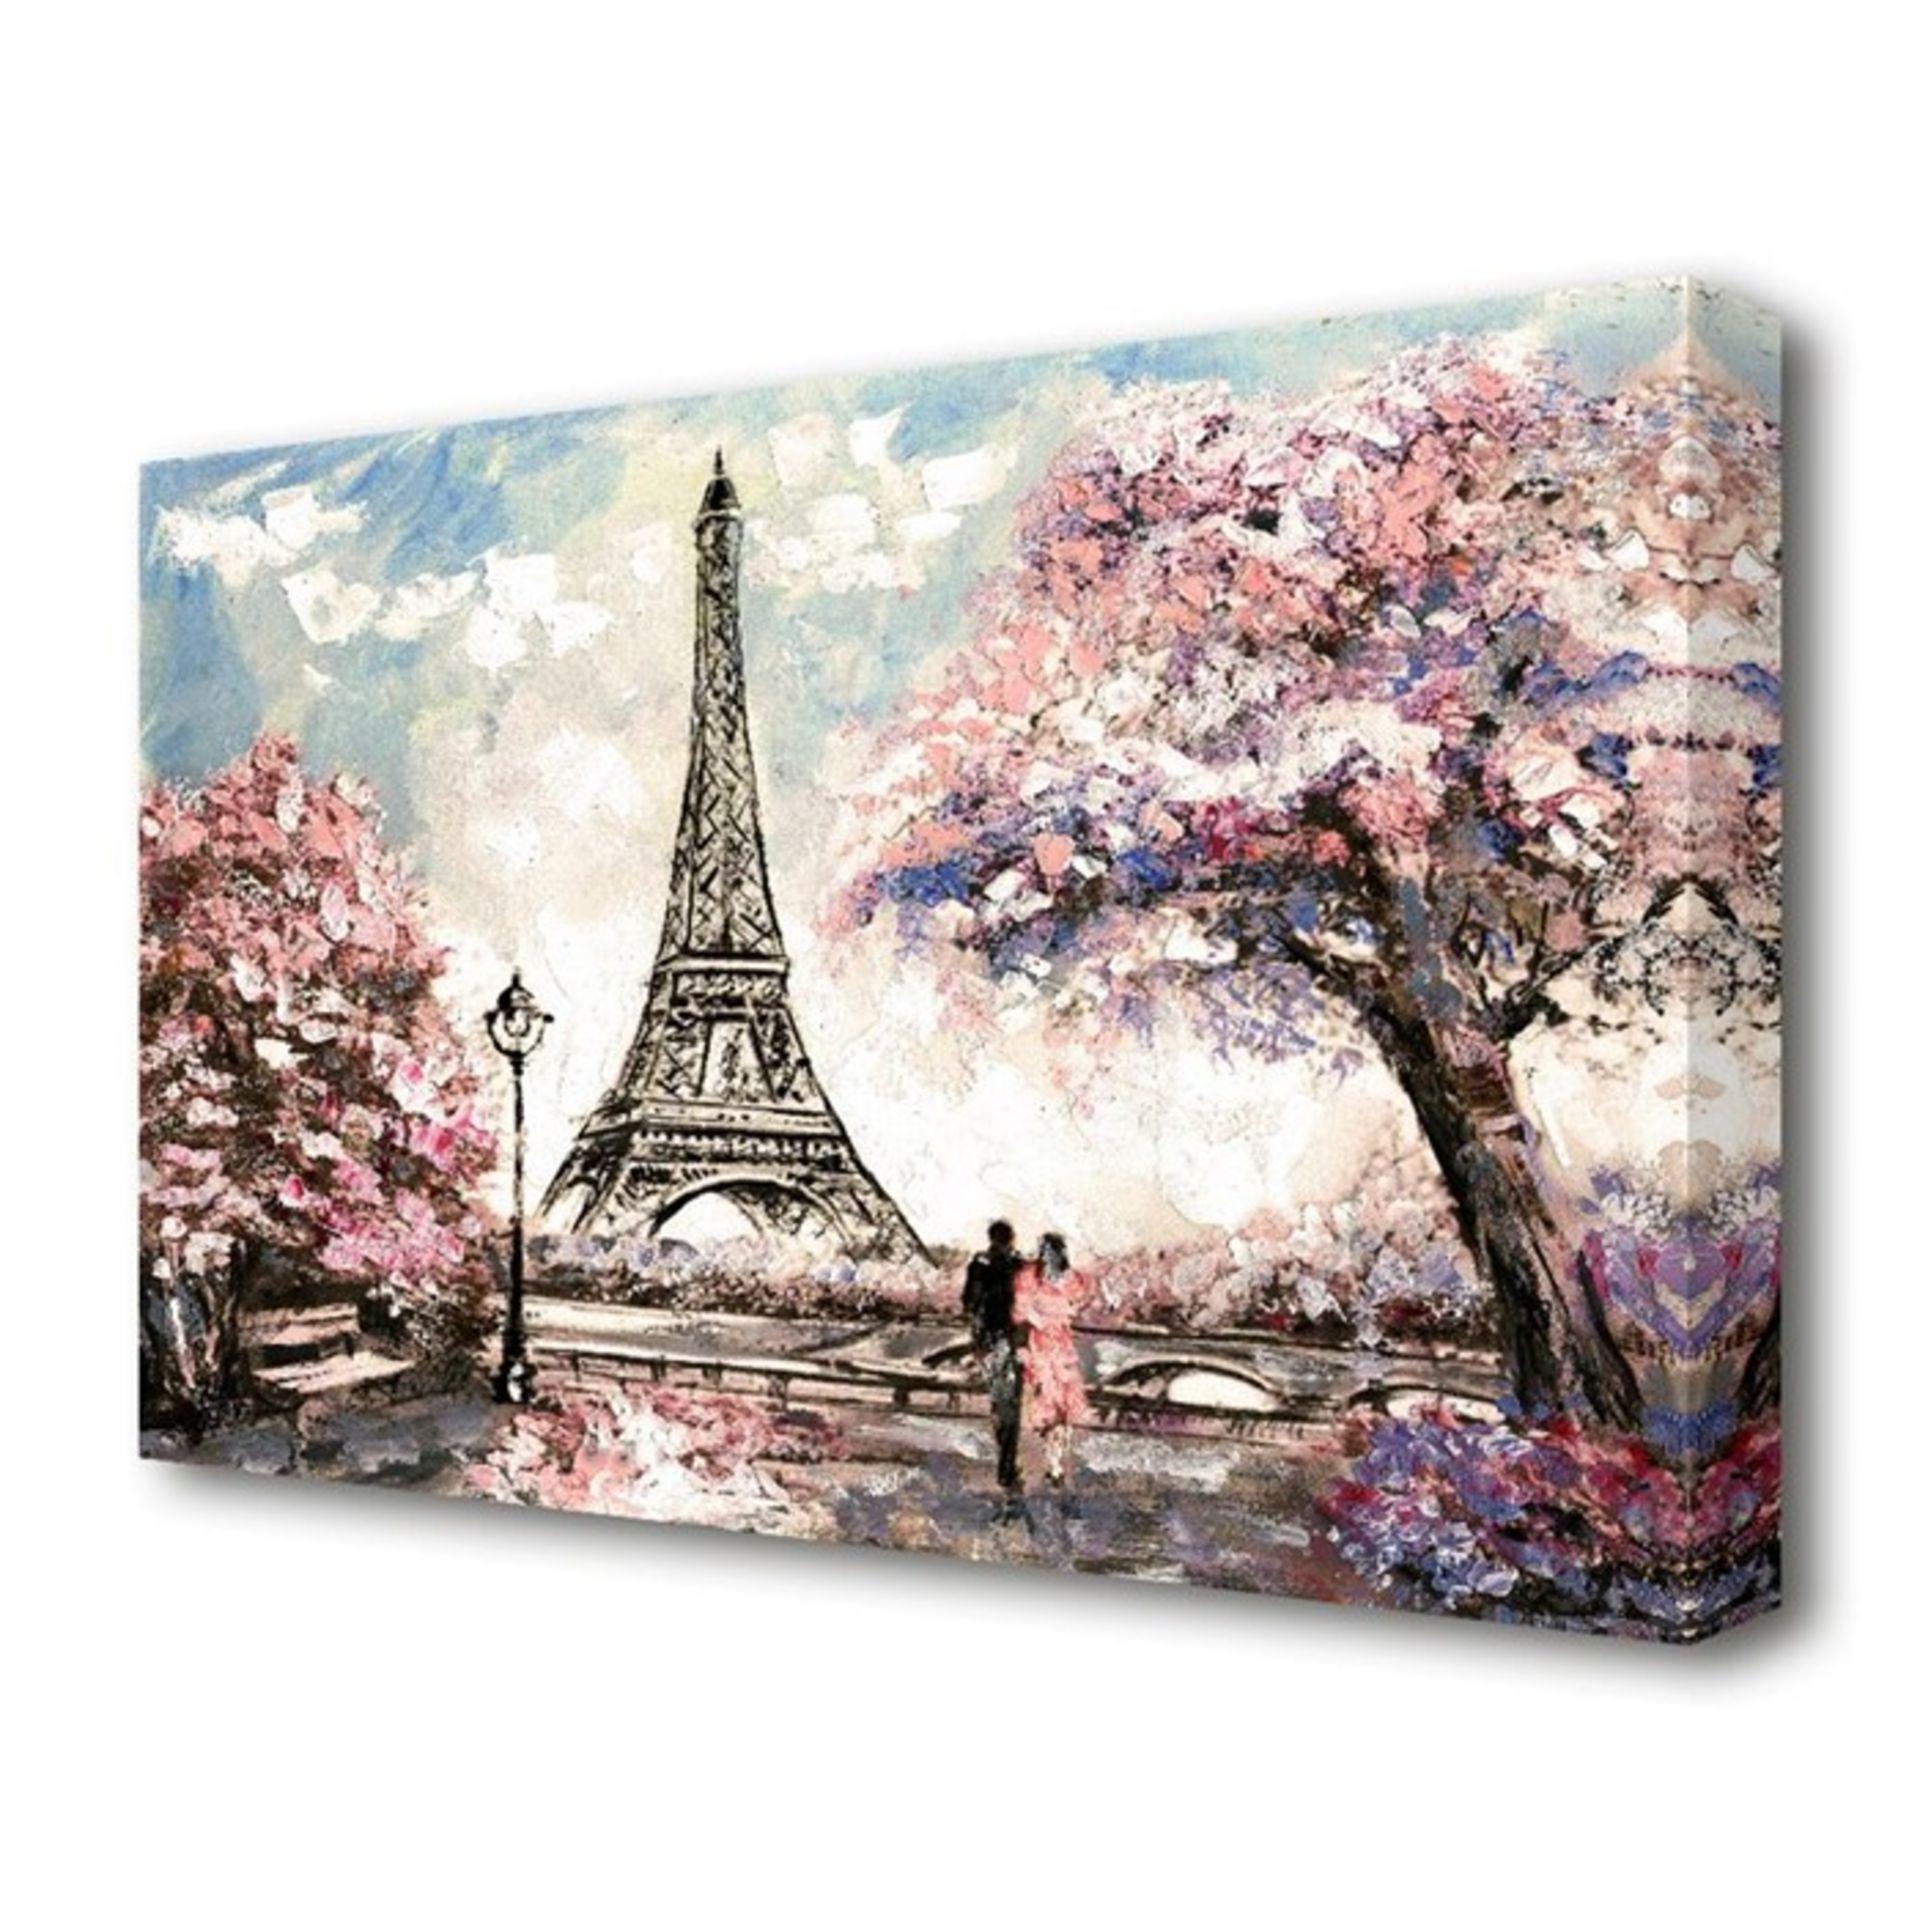 East Urban Home, 'Eiffel Tower Pink Tree Paris' Painting Print on Canvas - RRP £21.99 (BGSY5993 -